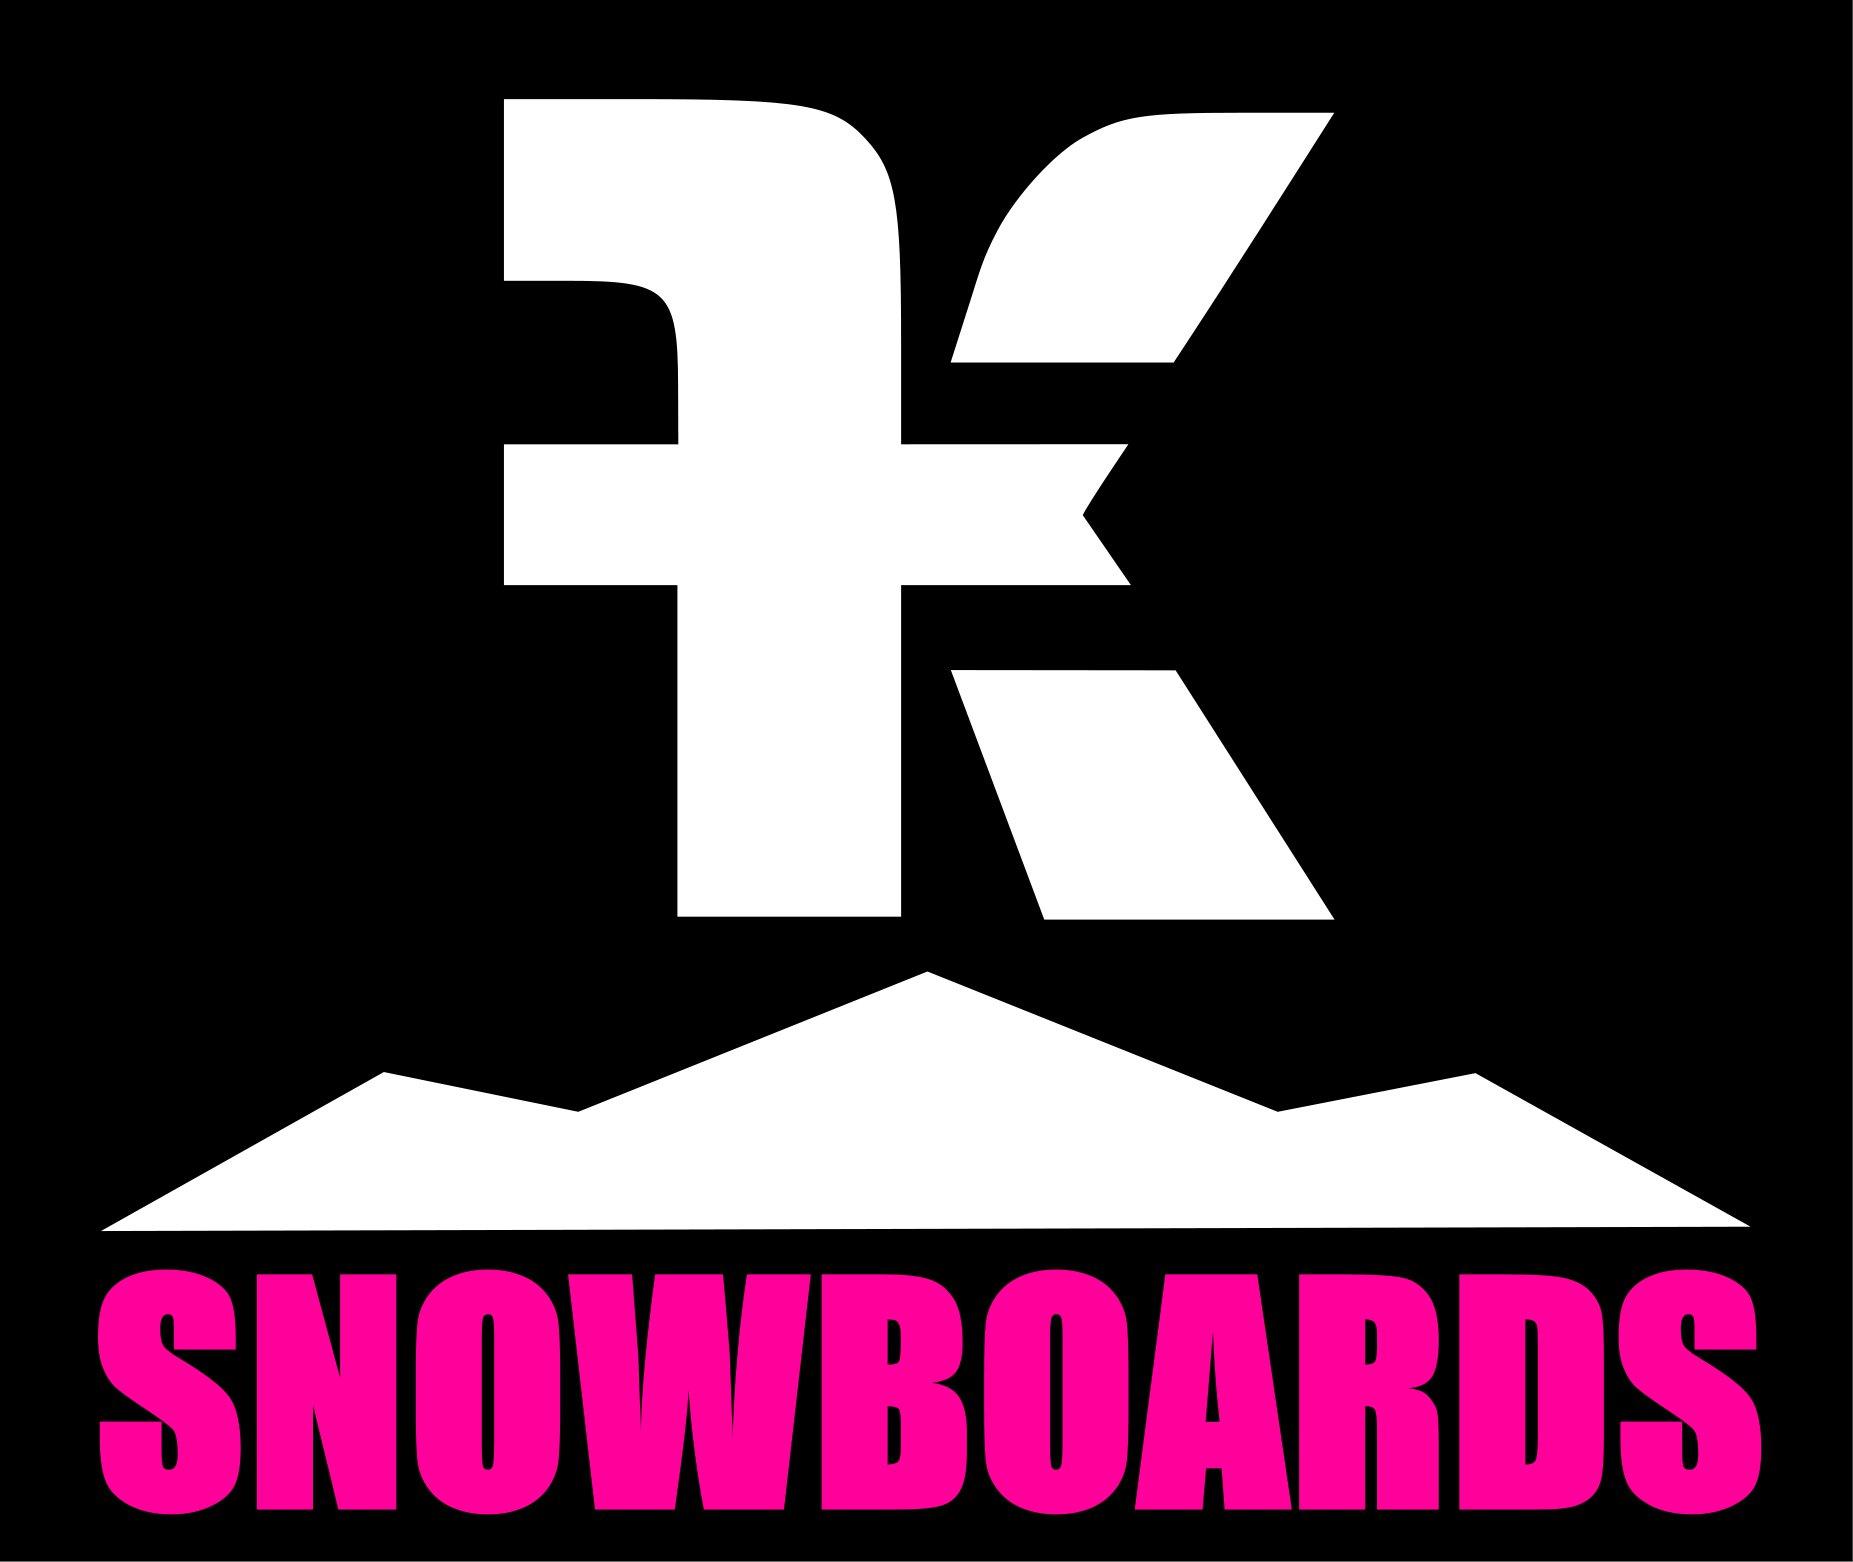 fk snowboads